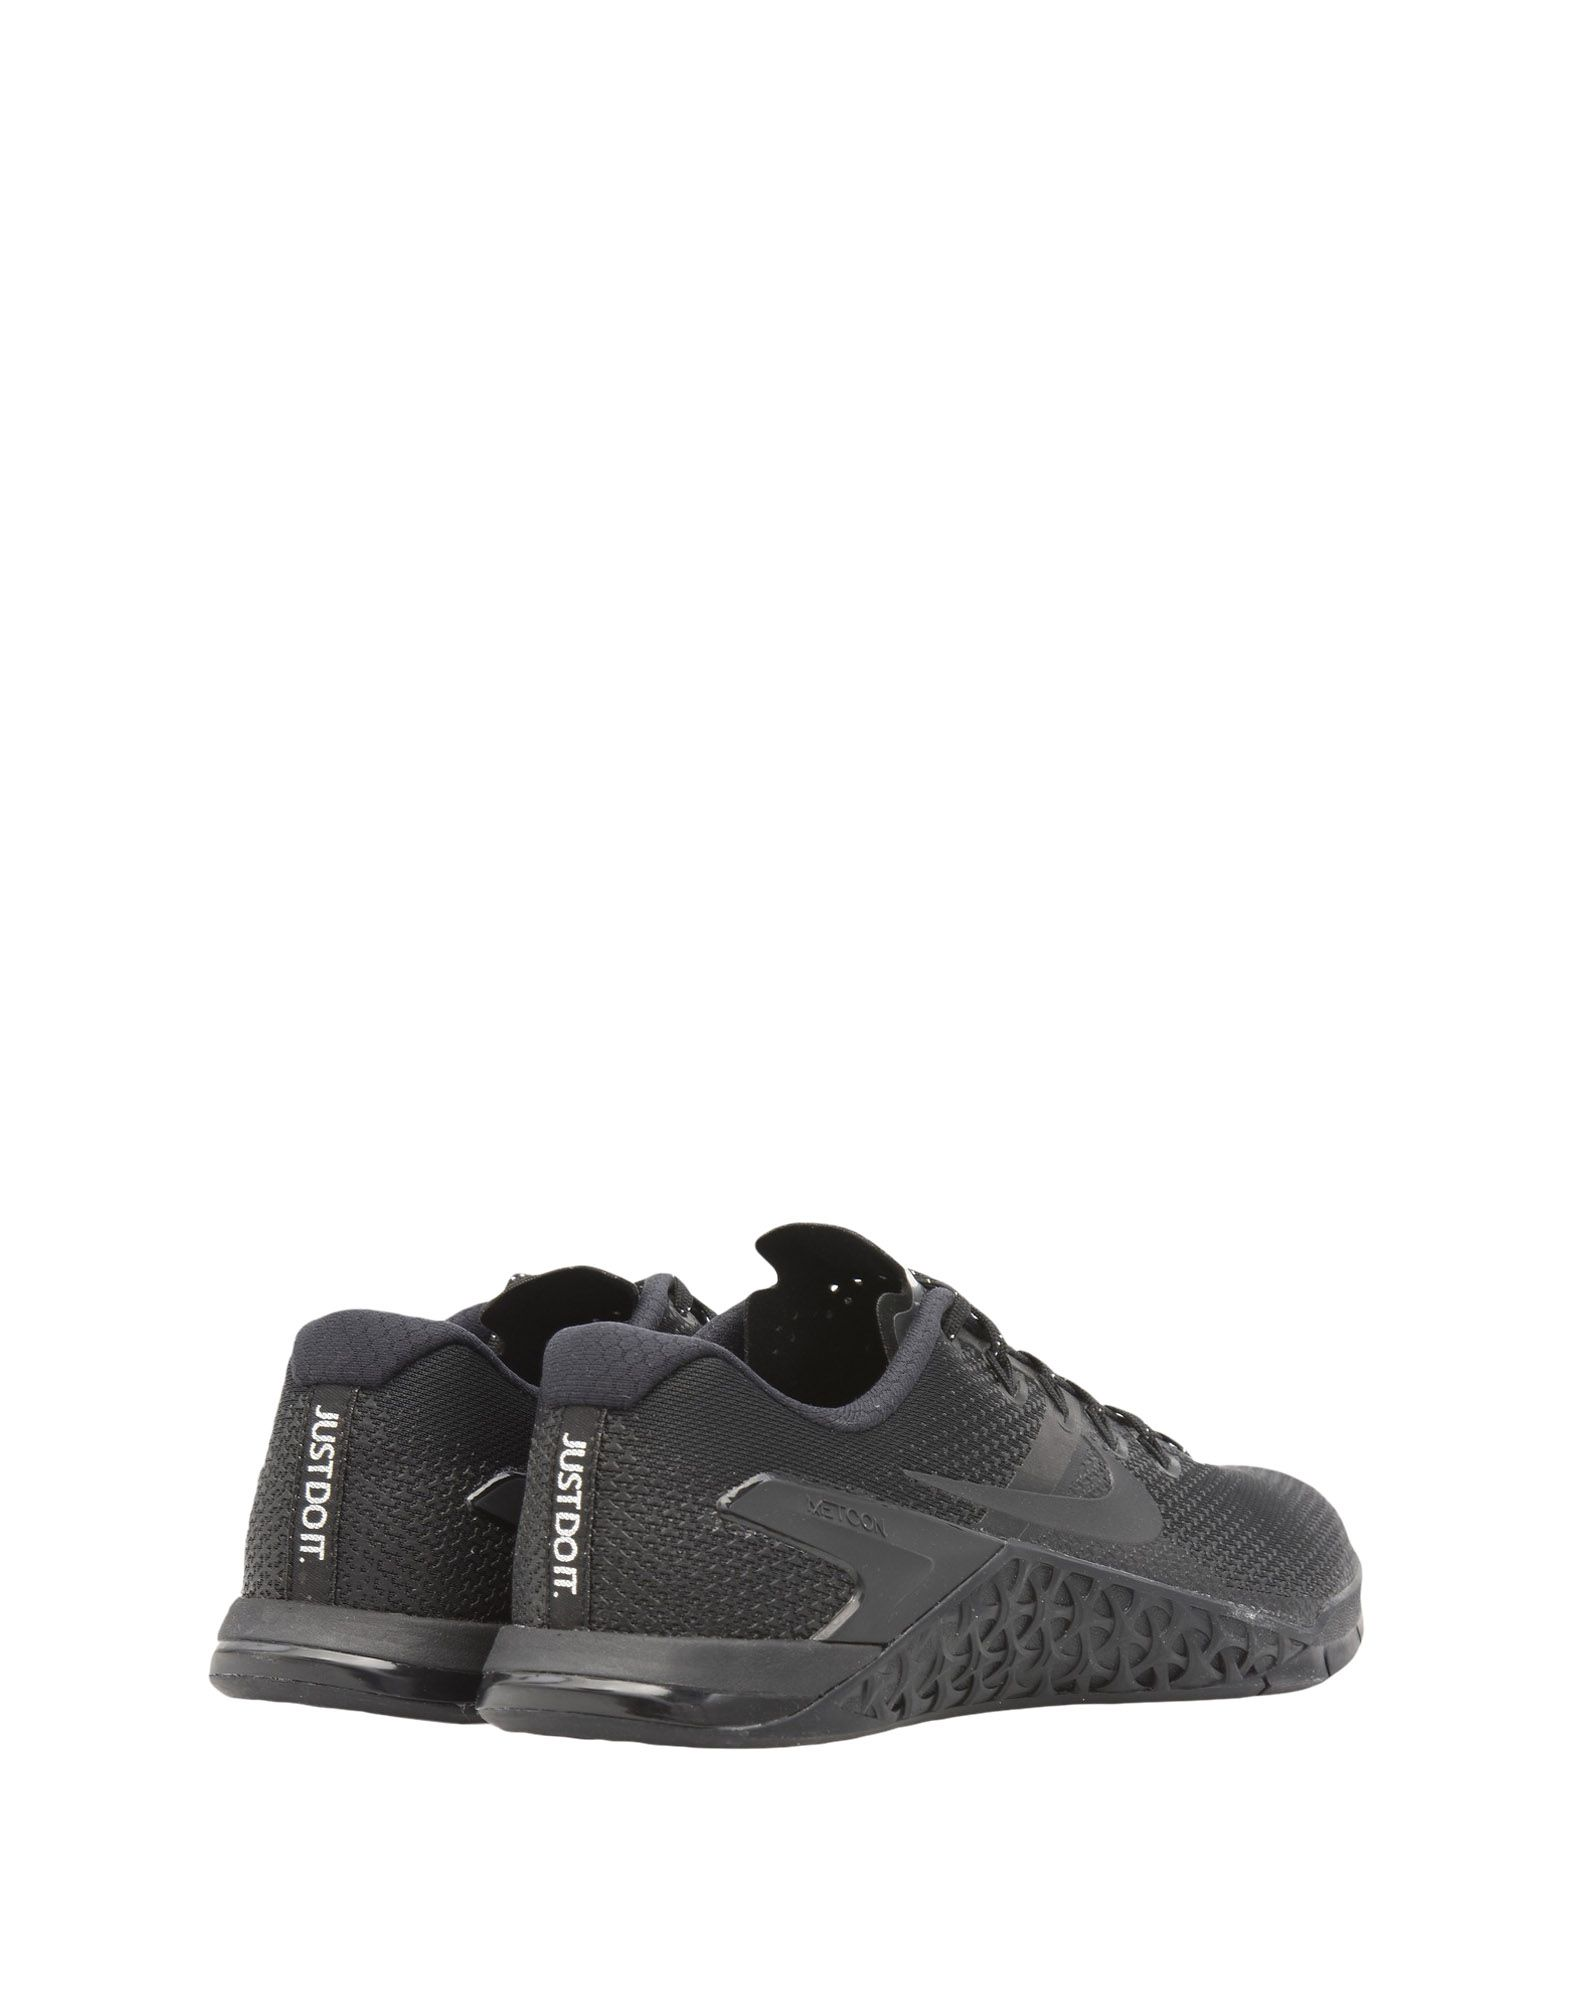 Nike Nike Nike   Metcon 4 Selfie  11440694FN Gute Qualität beliebte Schuhe 7b702a